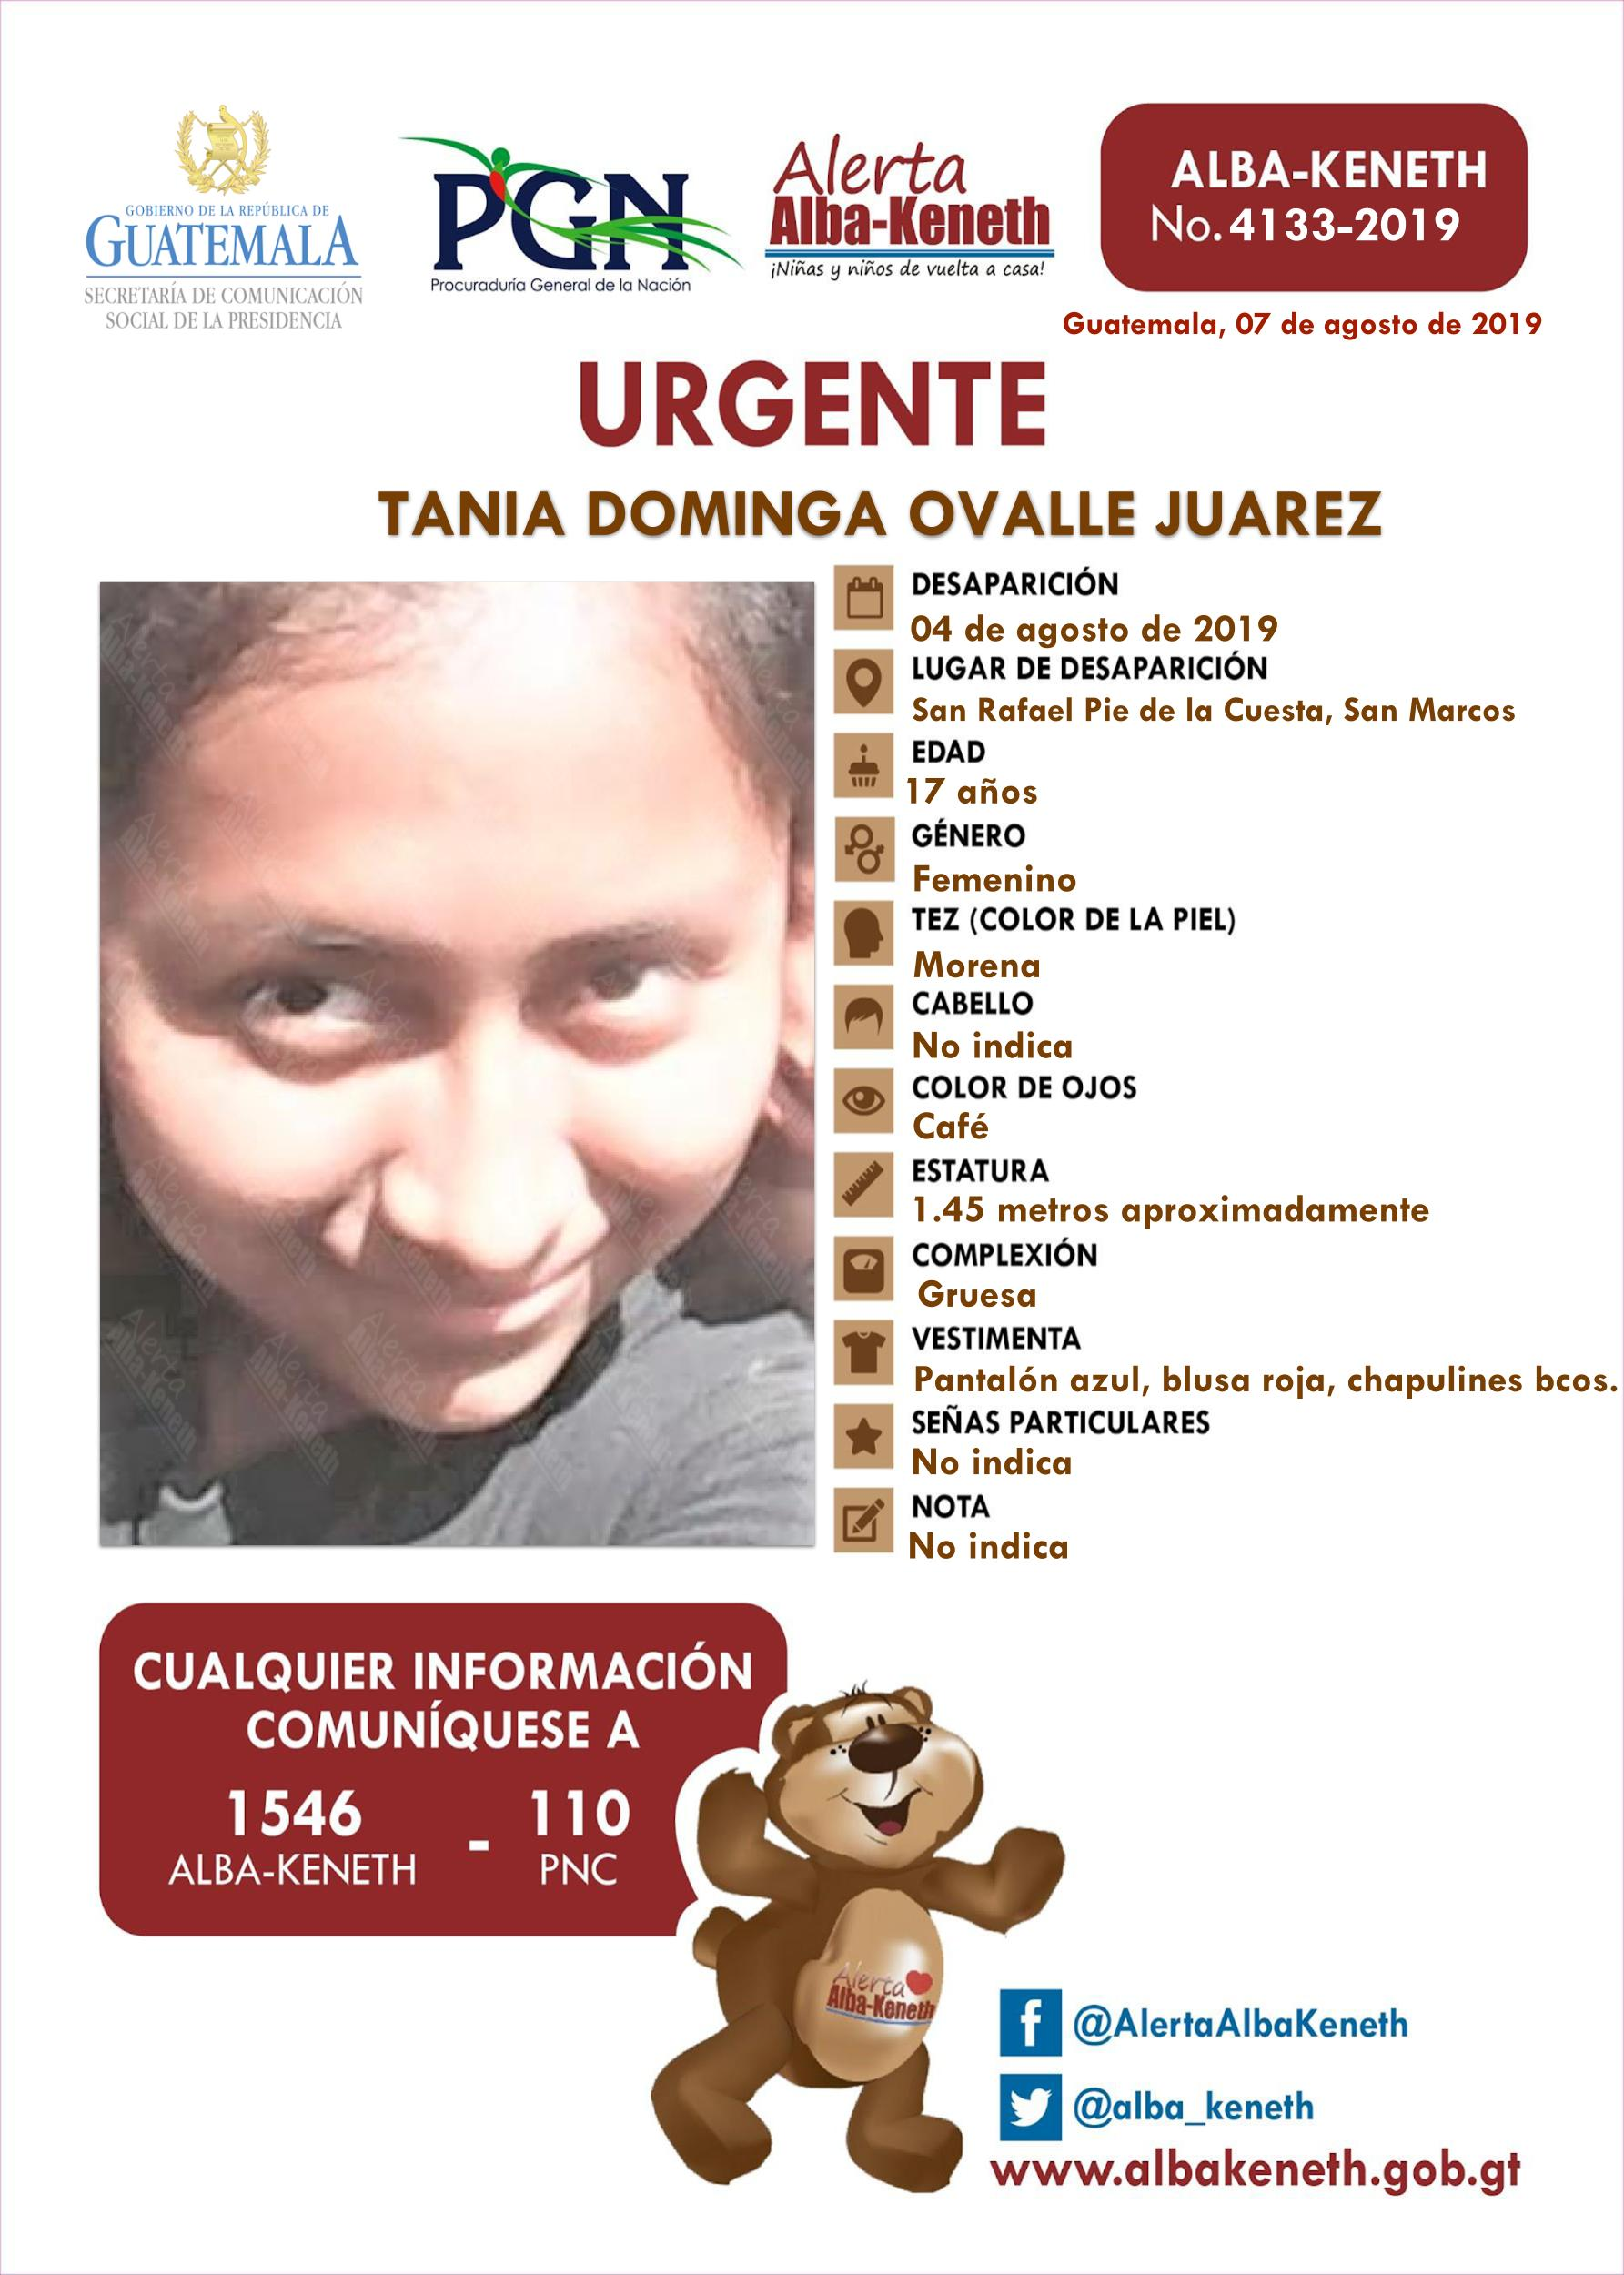 Tania Dominga Ovalle Juarez